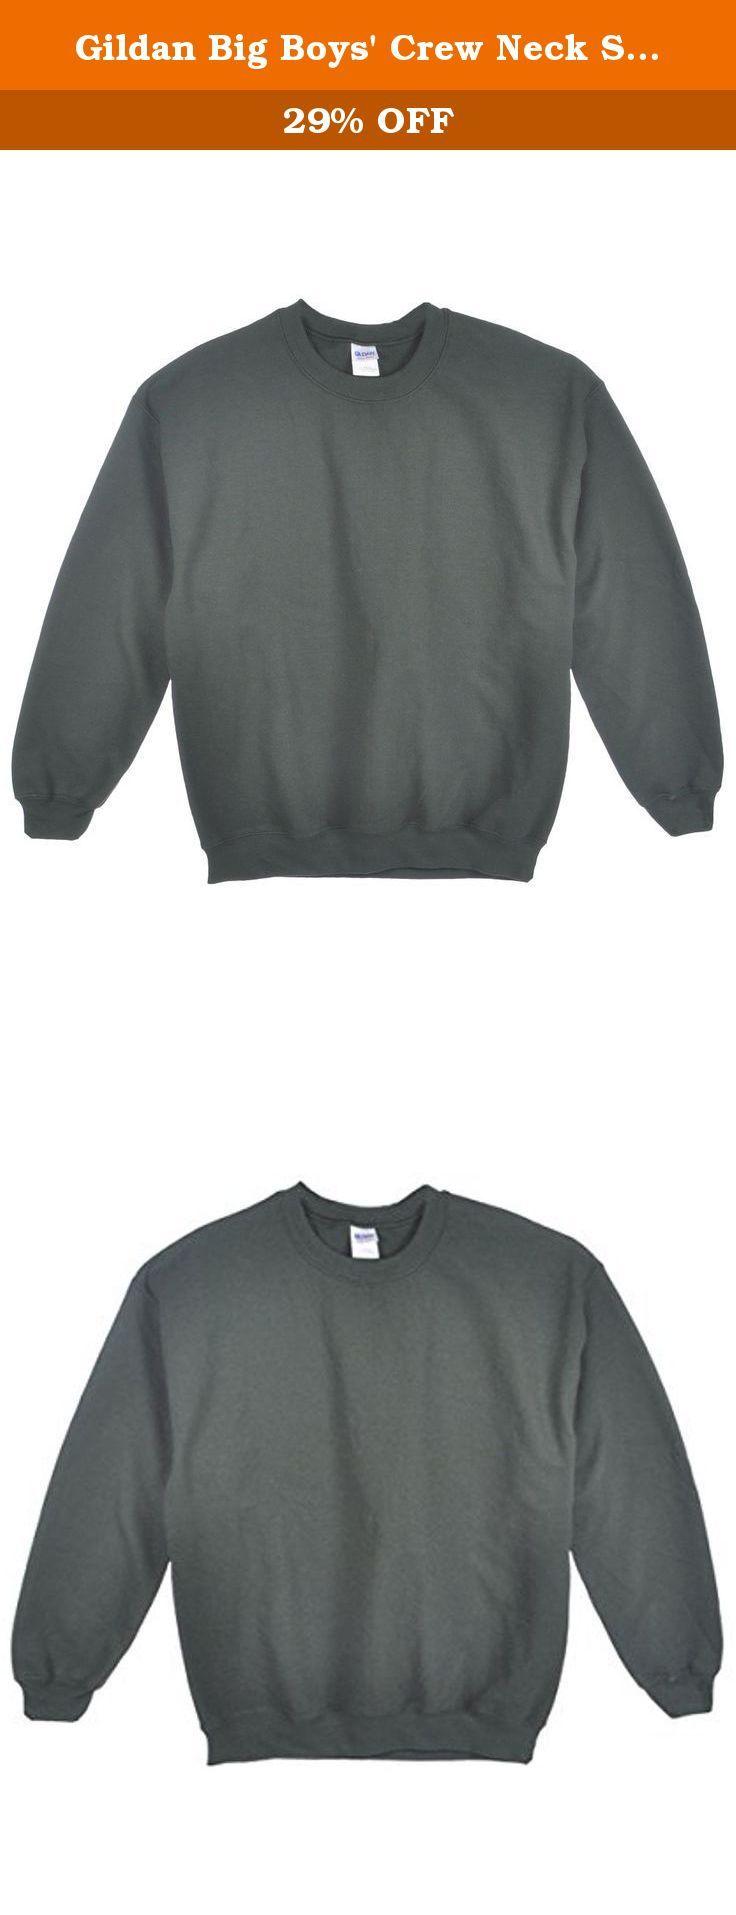 Gildan Big Boys Crew Neck Sweatshirt Green Xs 4 5 For School And Play This Gildan Sweatshirt Delivers Gildan Sweatshirts Crew Neck Sweatshirt Sweatshirts [ 1915 x 736 Pixel ]